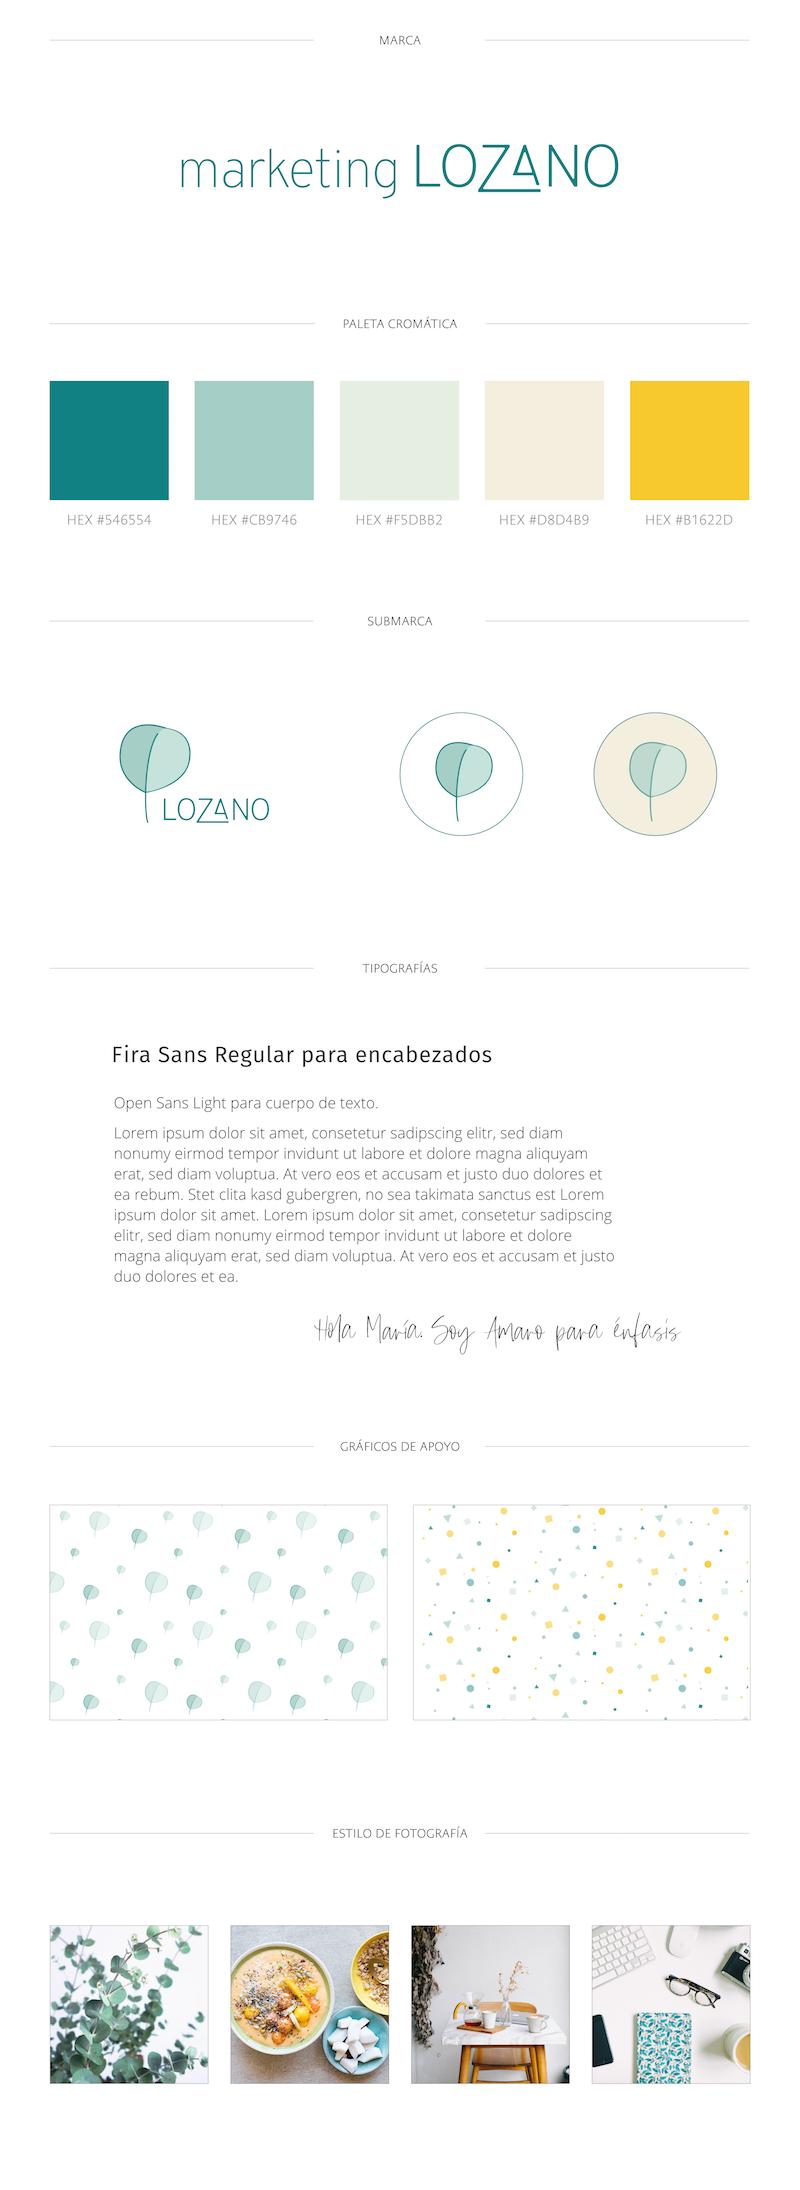 Brand Board para Marketing Lozano.